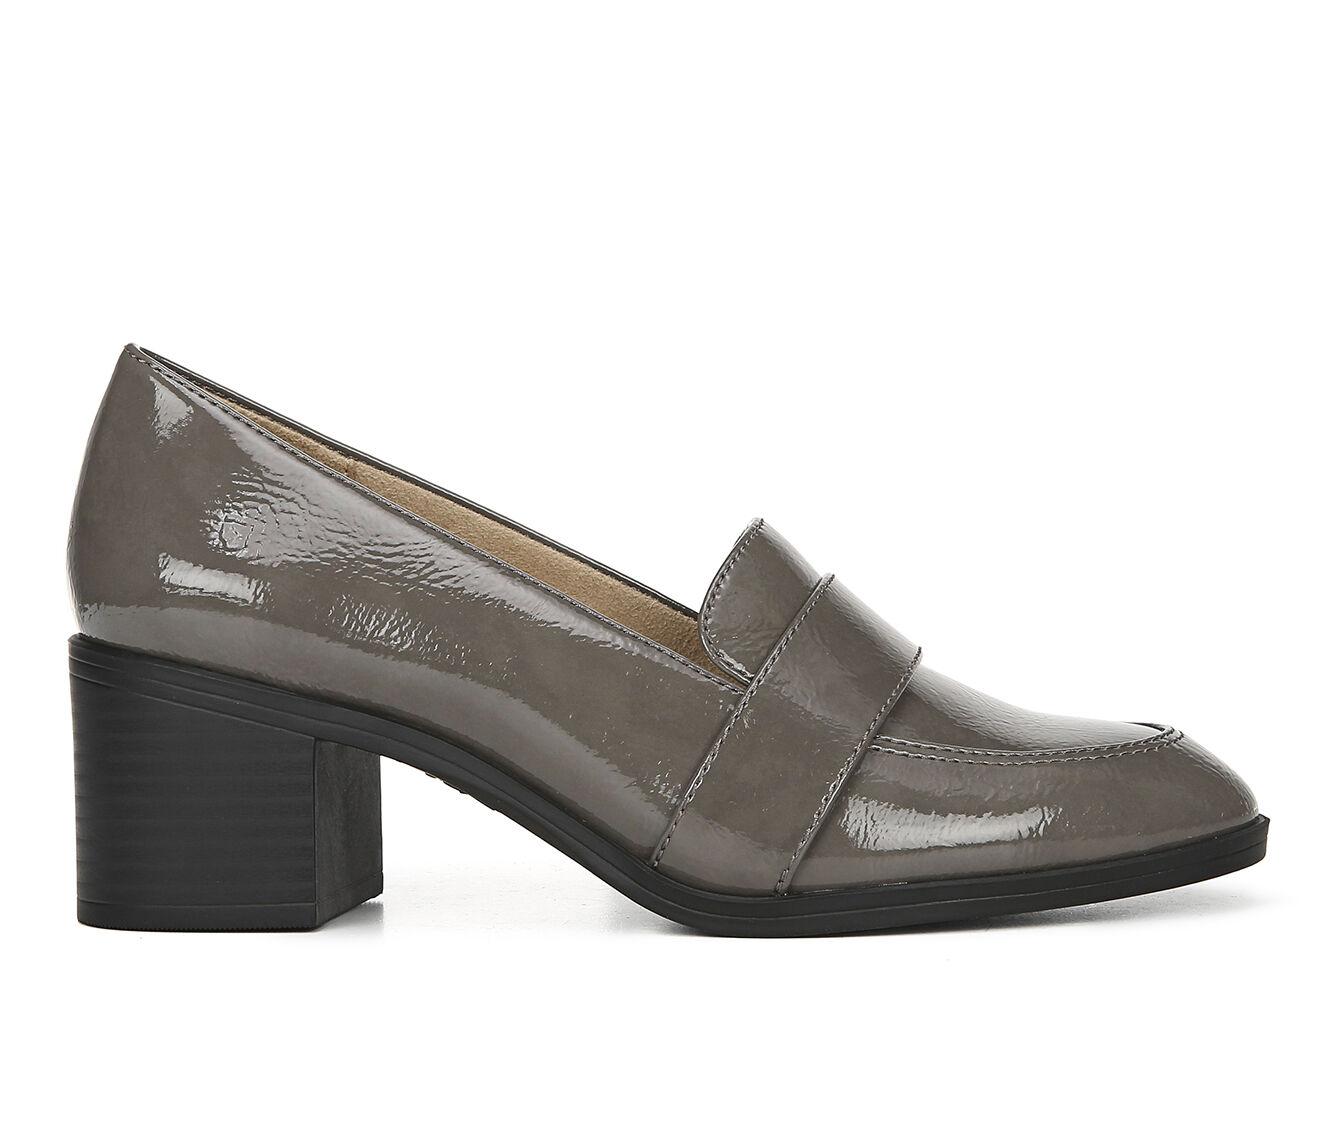 uk shoes_kd5752